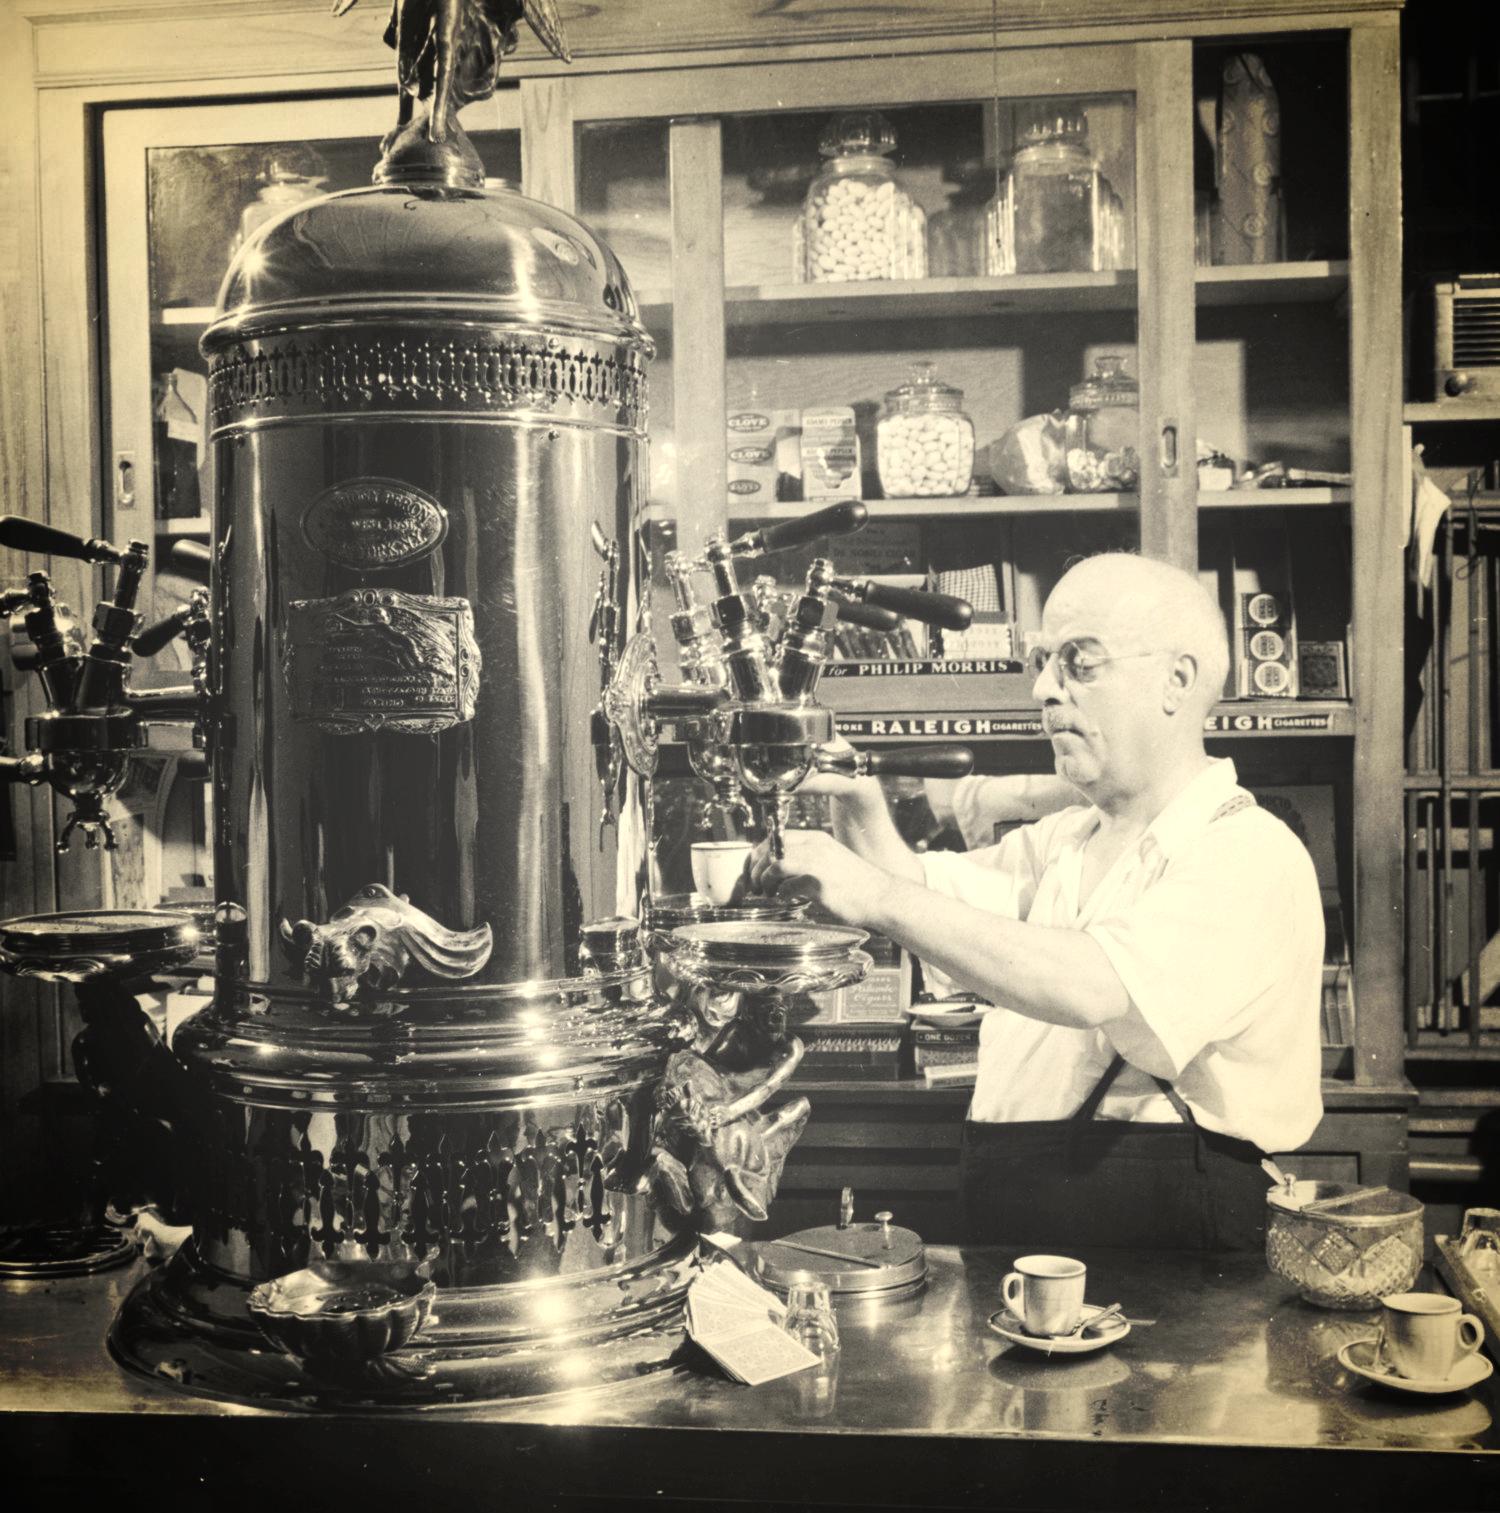 Mixpresso First Espresso Steam Machine